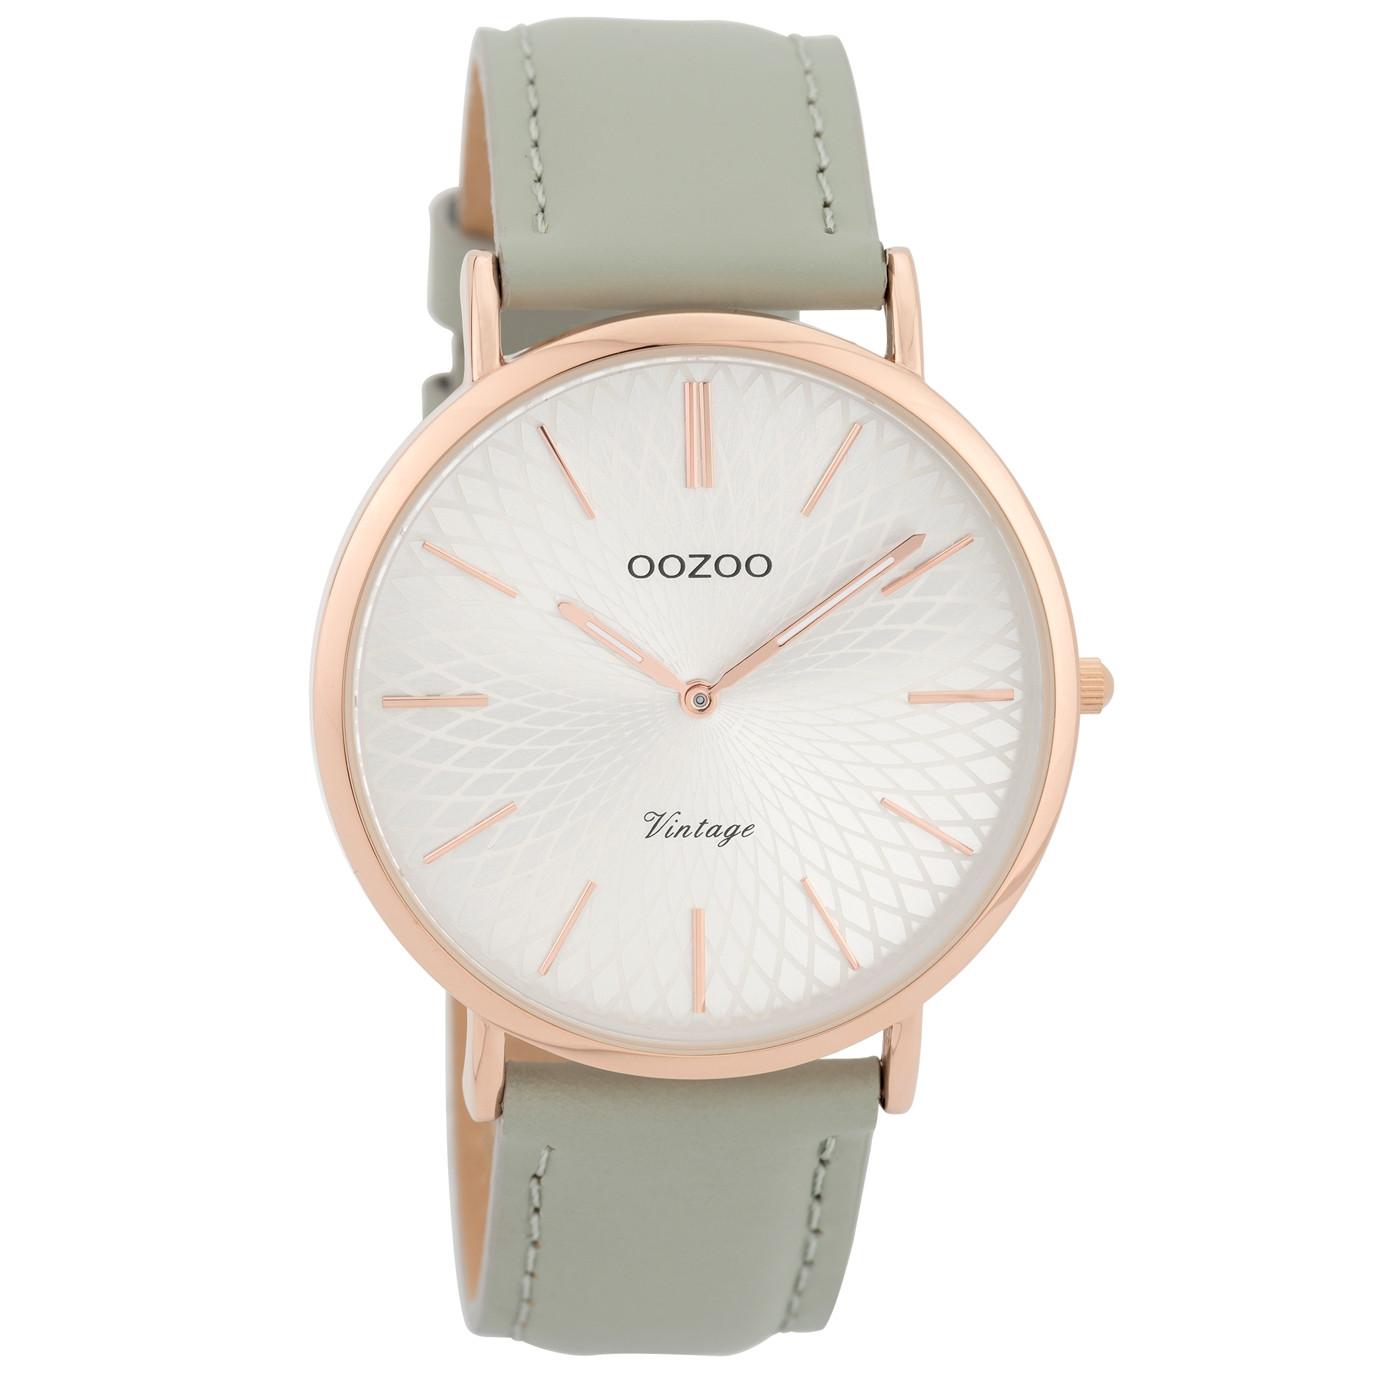 OOZOO Vintage Grijs/Zilverkleurig horloge C9334 (40 mm)